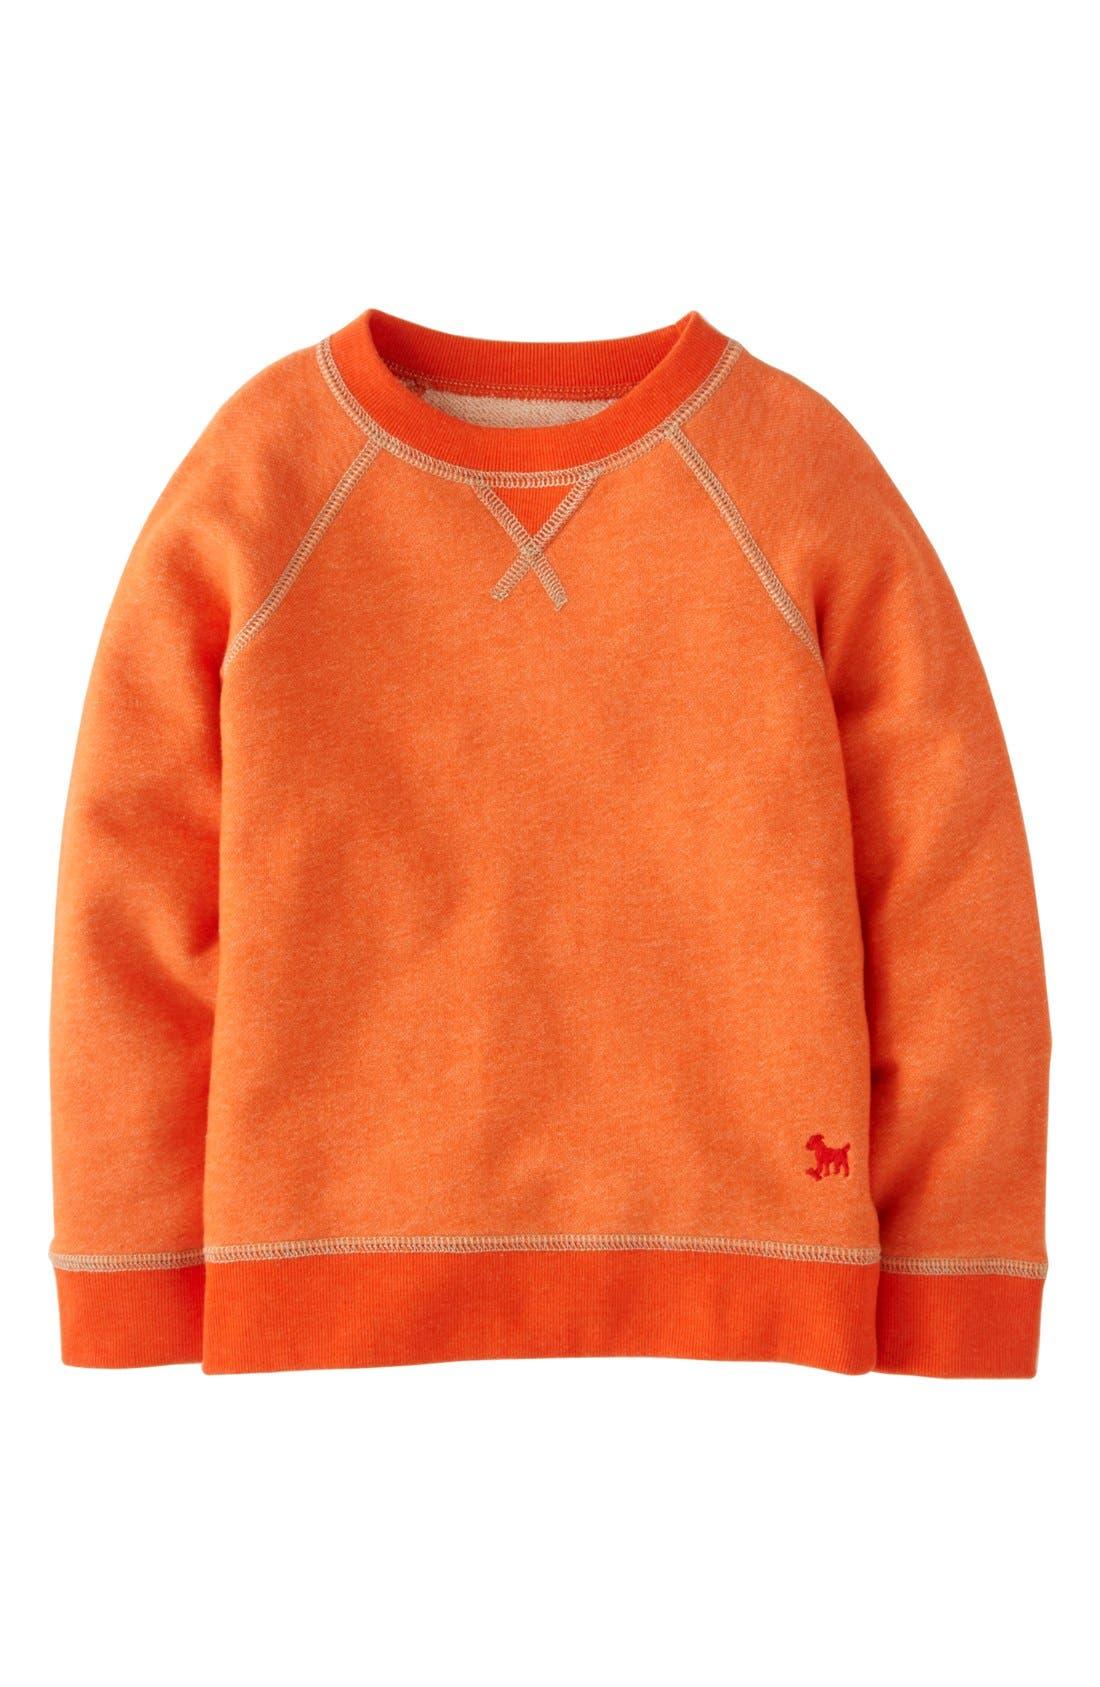 Main Image - Mini Boden Sweatshirt (Toddler Boys, Little Boys & Big Boys)